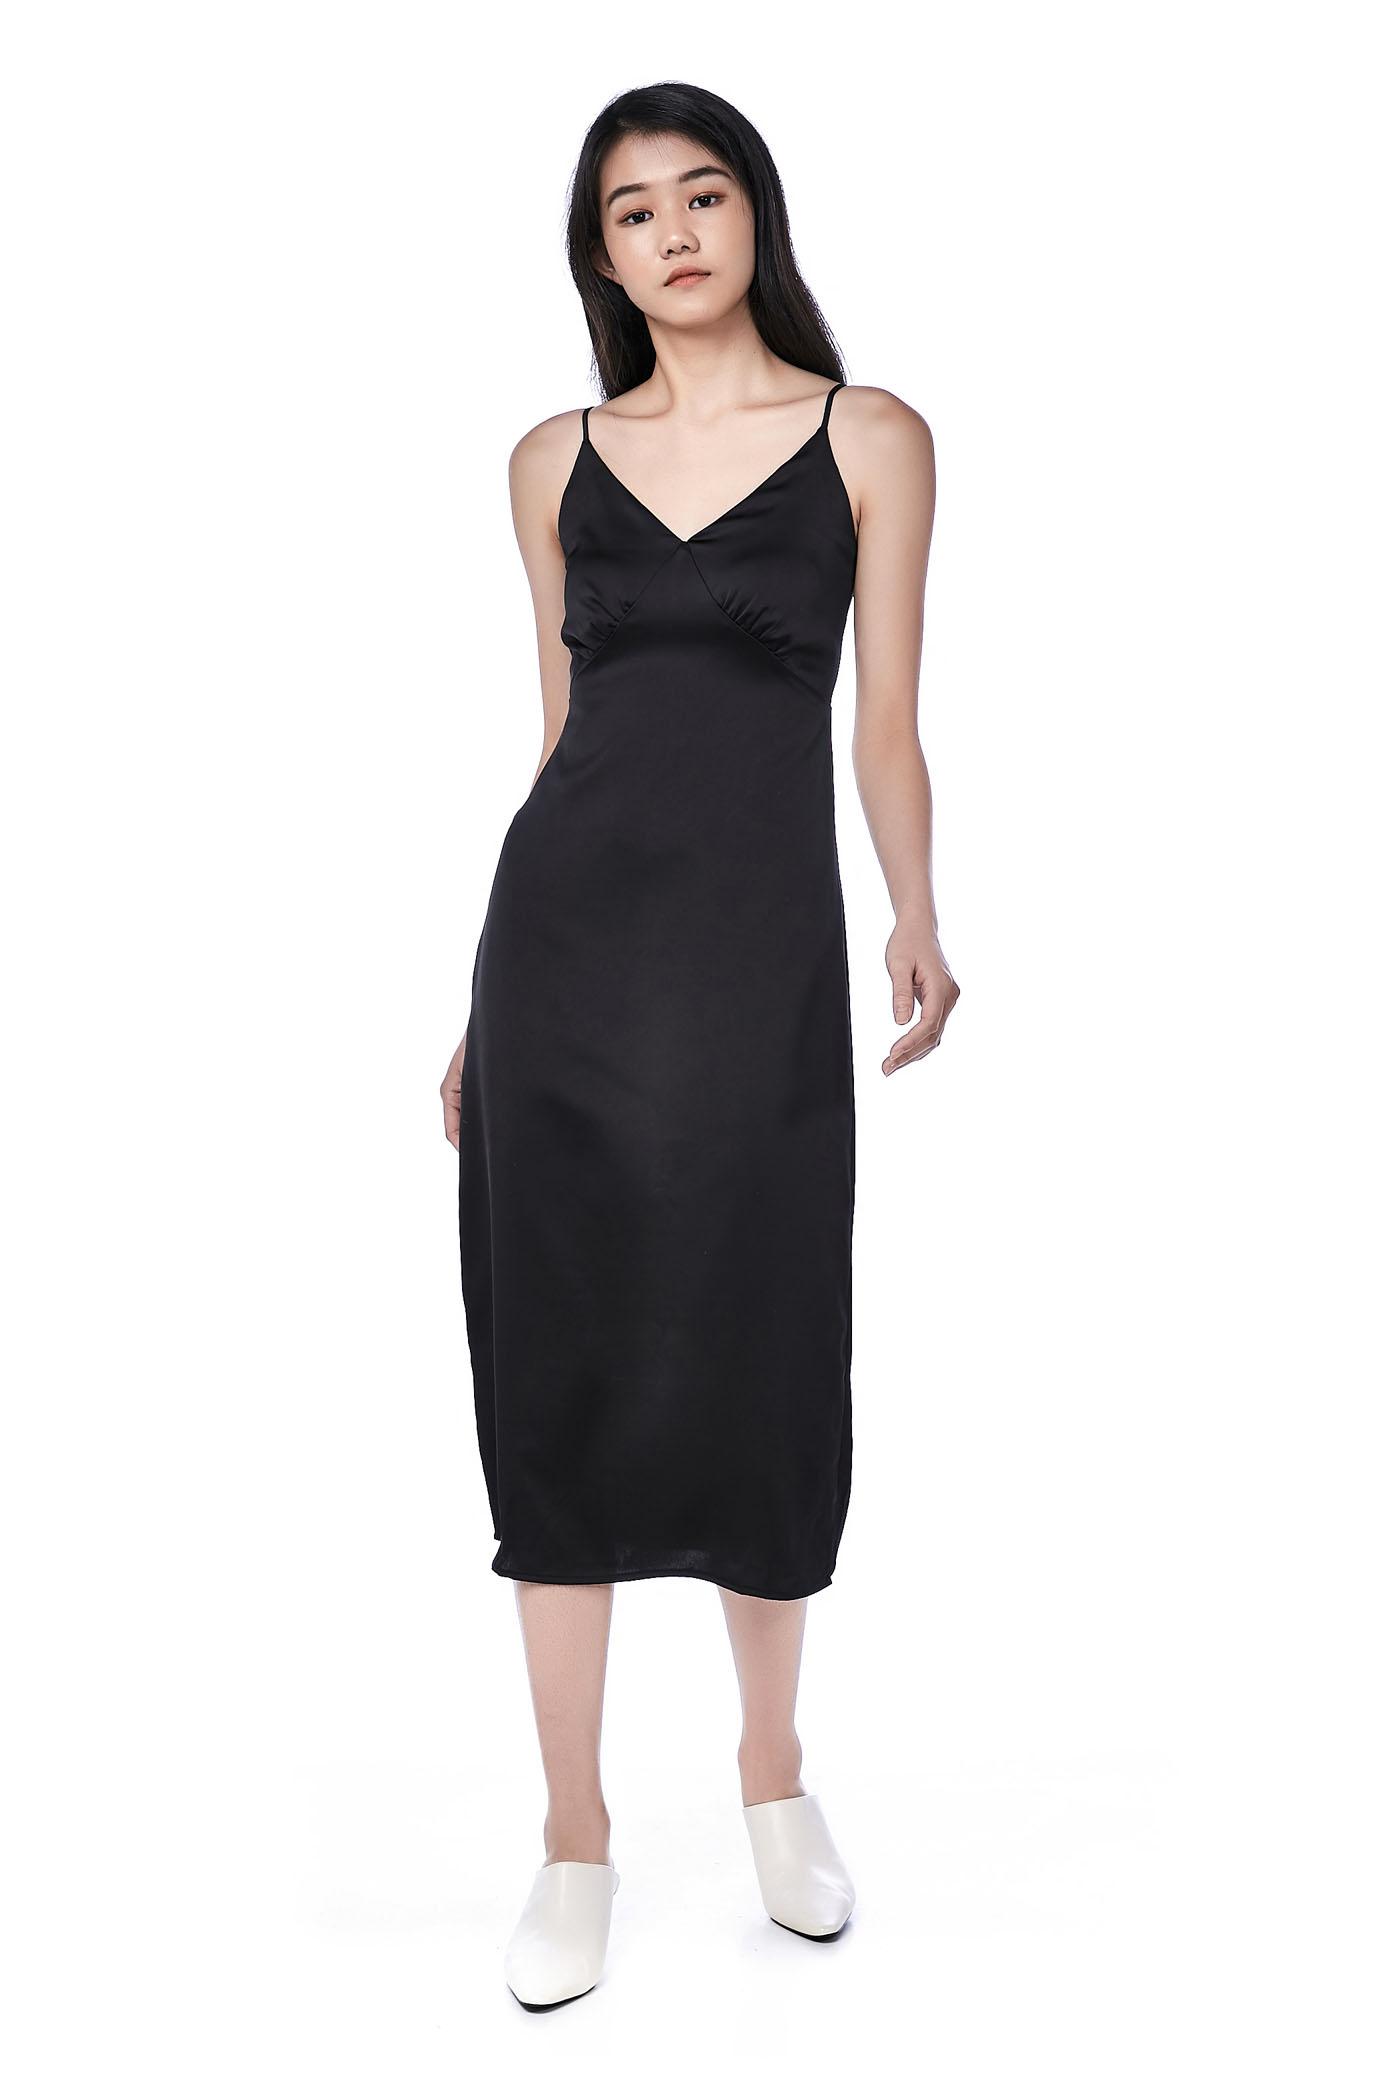 Malfy Slip Dress